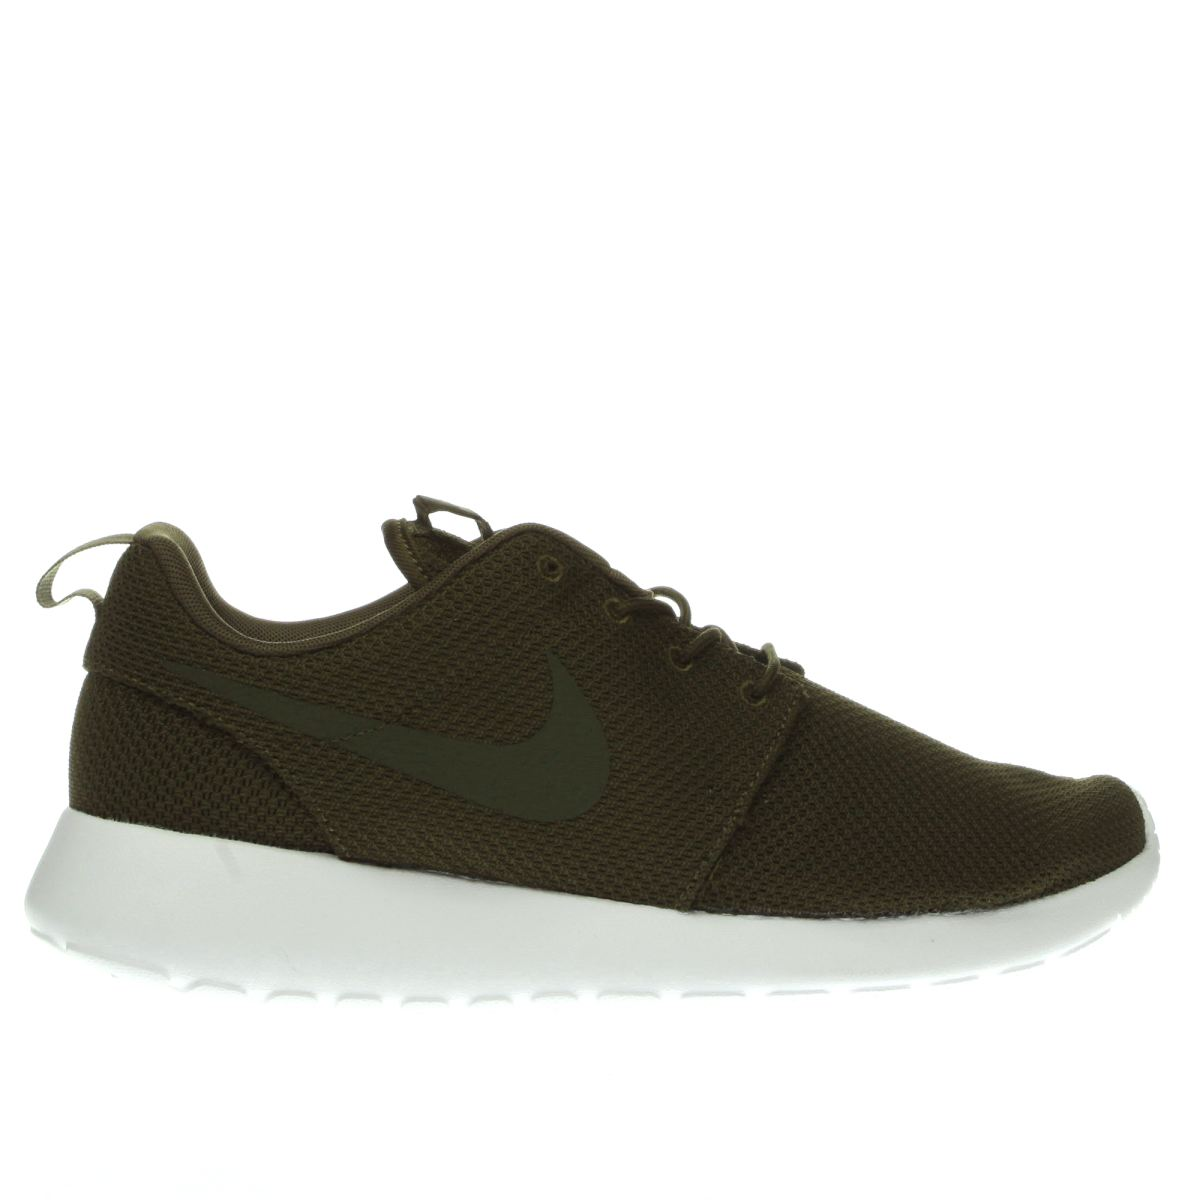 utzbx Mens Dark Green Nike Roshe One Trainers | schuh